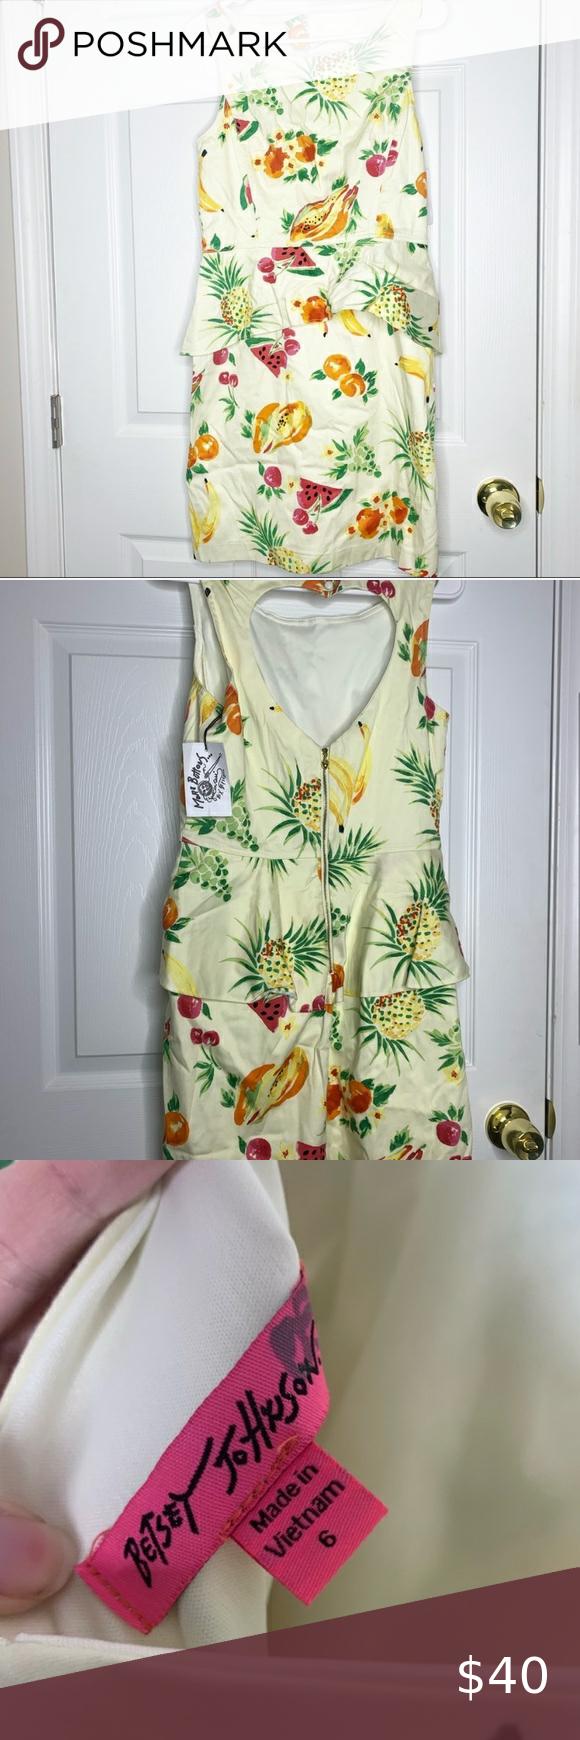 35+ Betsey johnson fruit dress inspirations